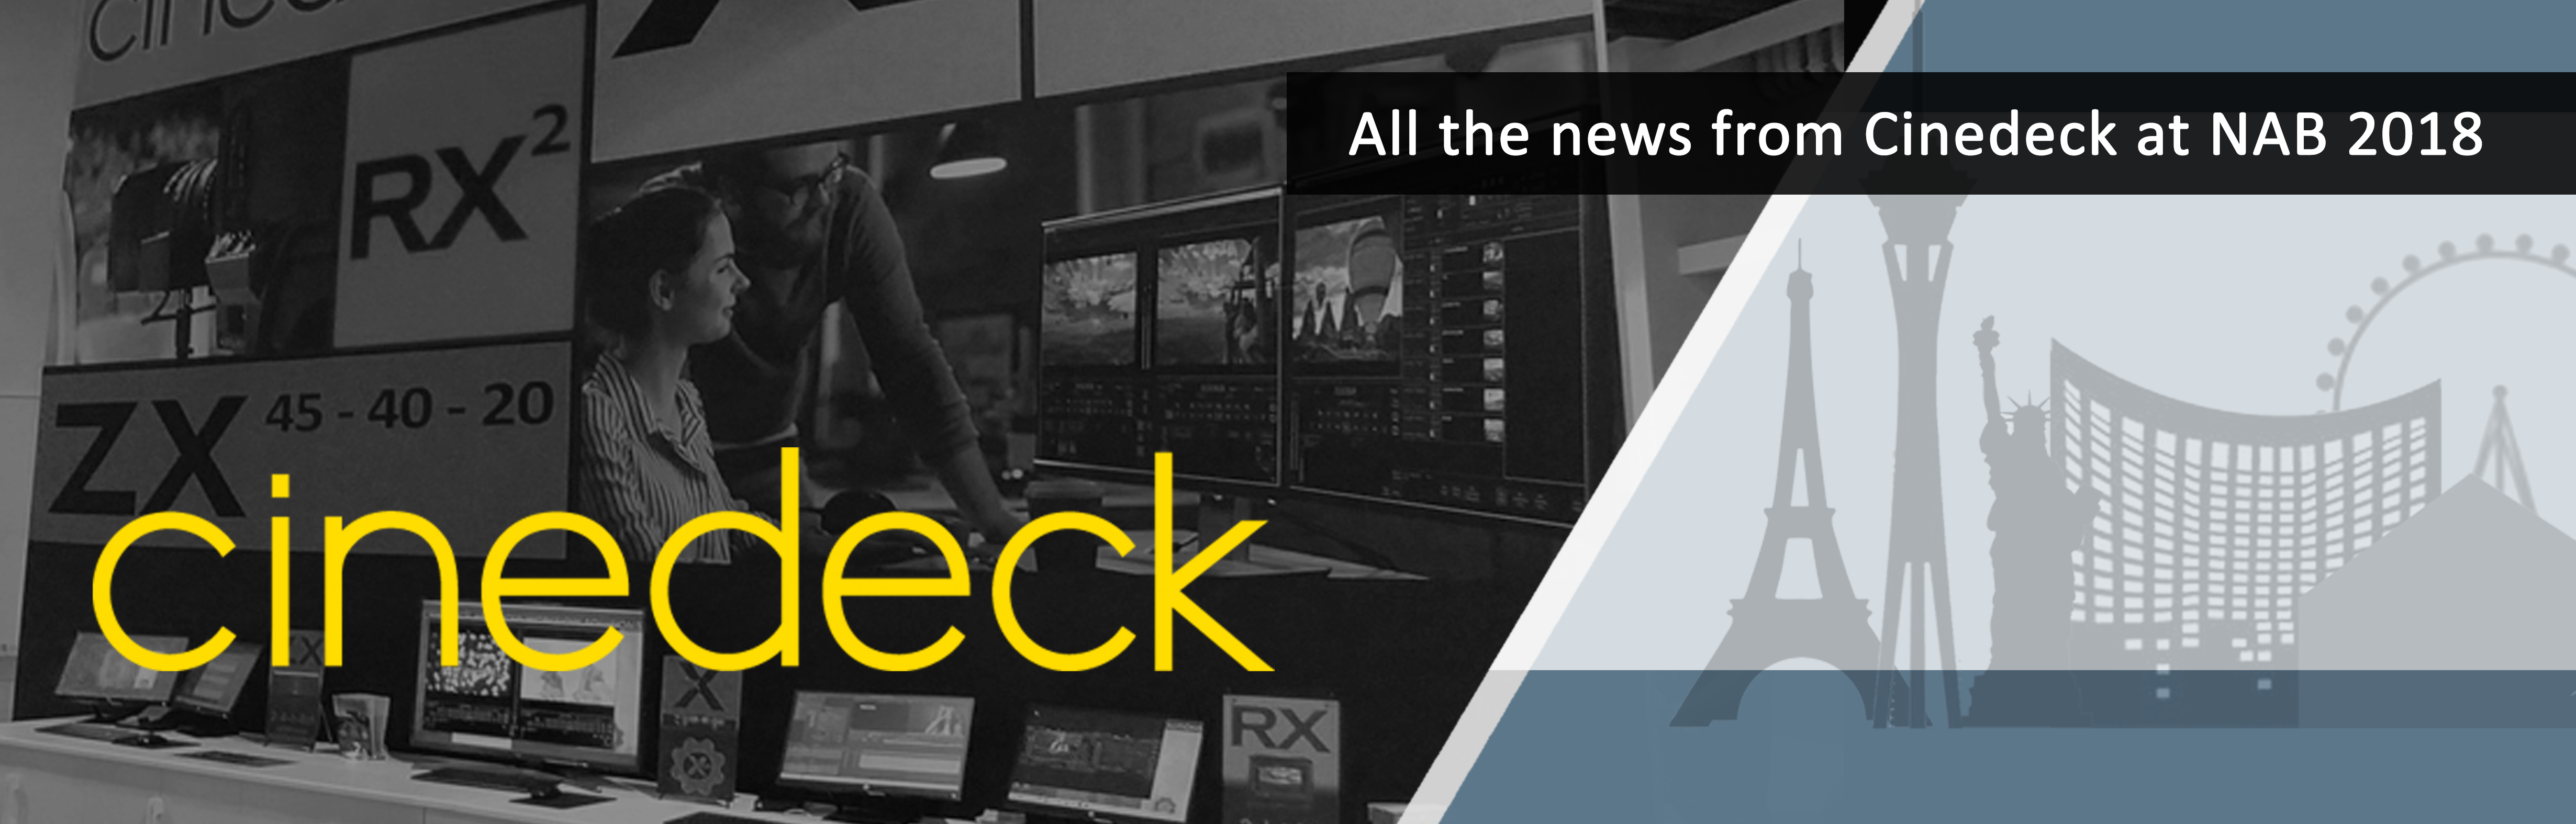 Post NAB 2018 News From Cinedeck_Header